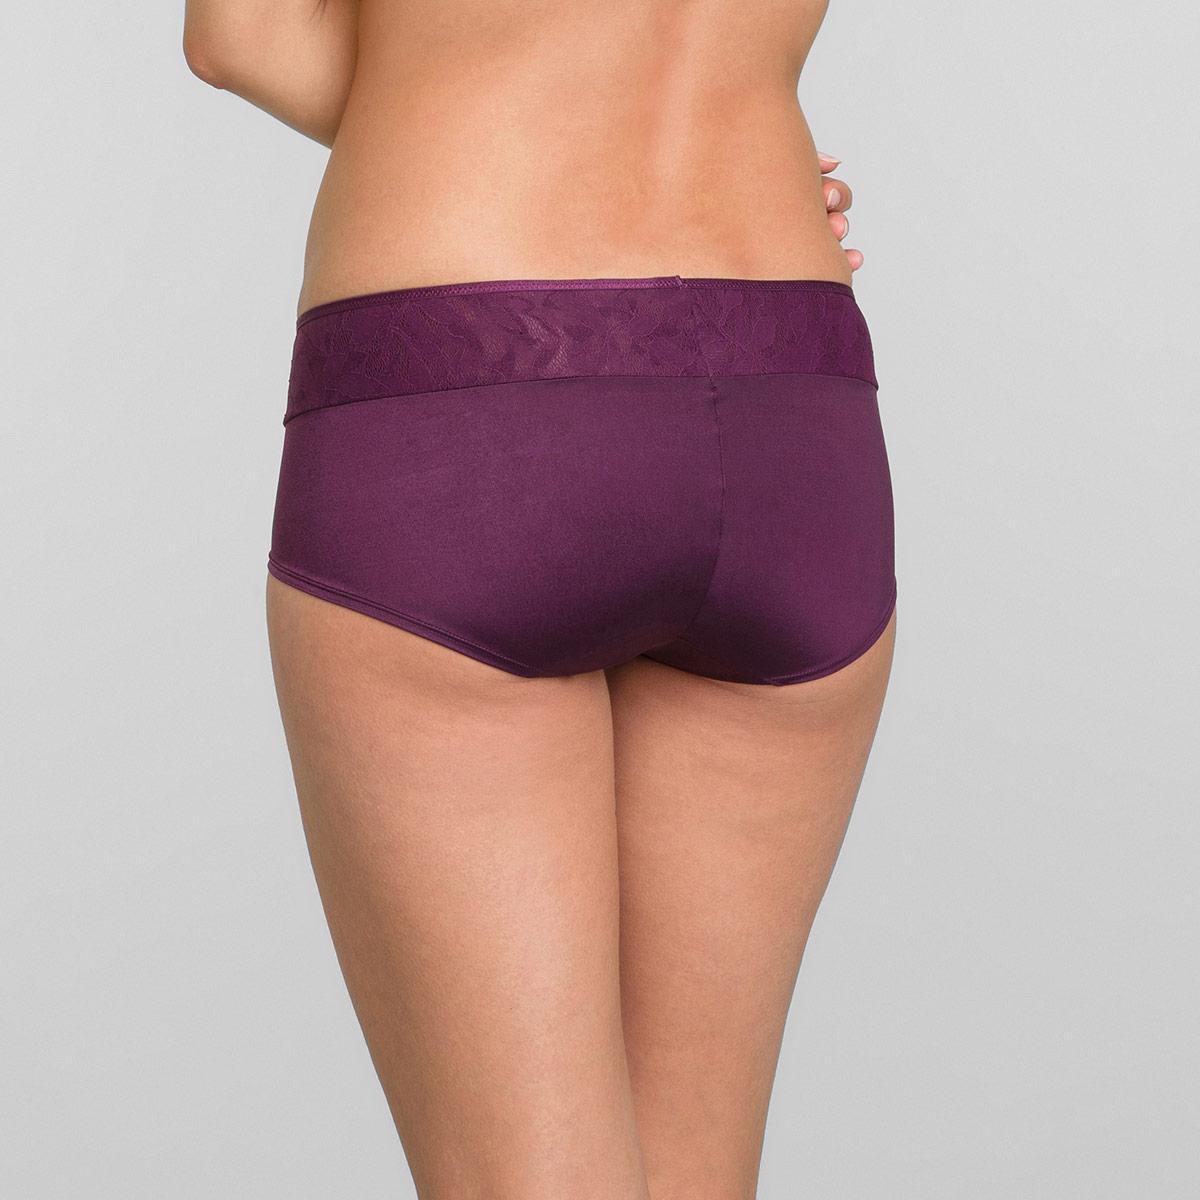 Shorts in Dark Boysenberry Ideal Beauty Lace, , PLAYTEX